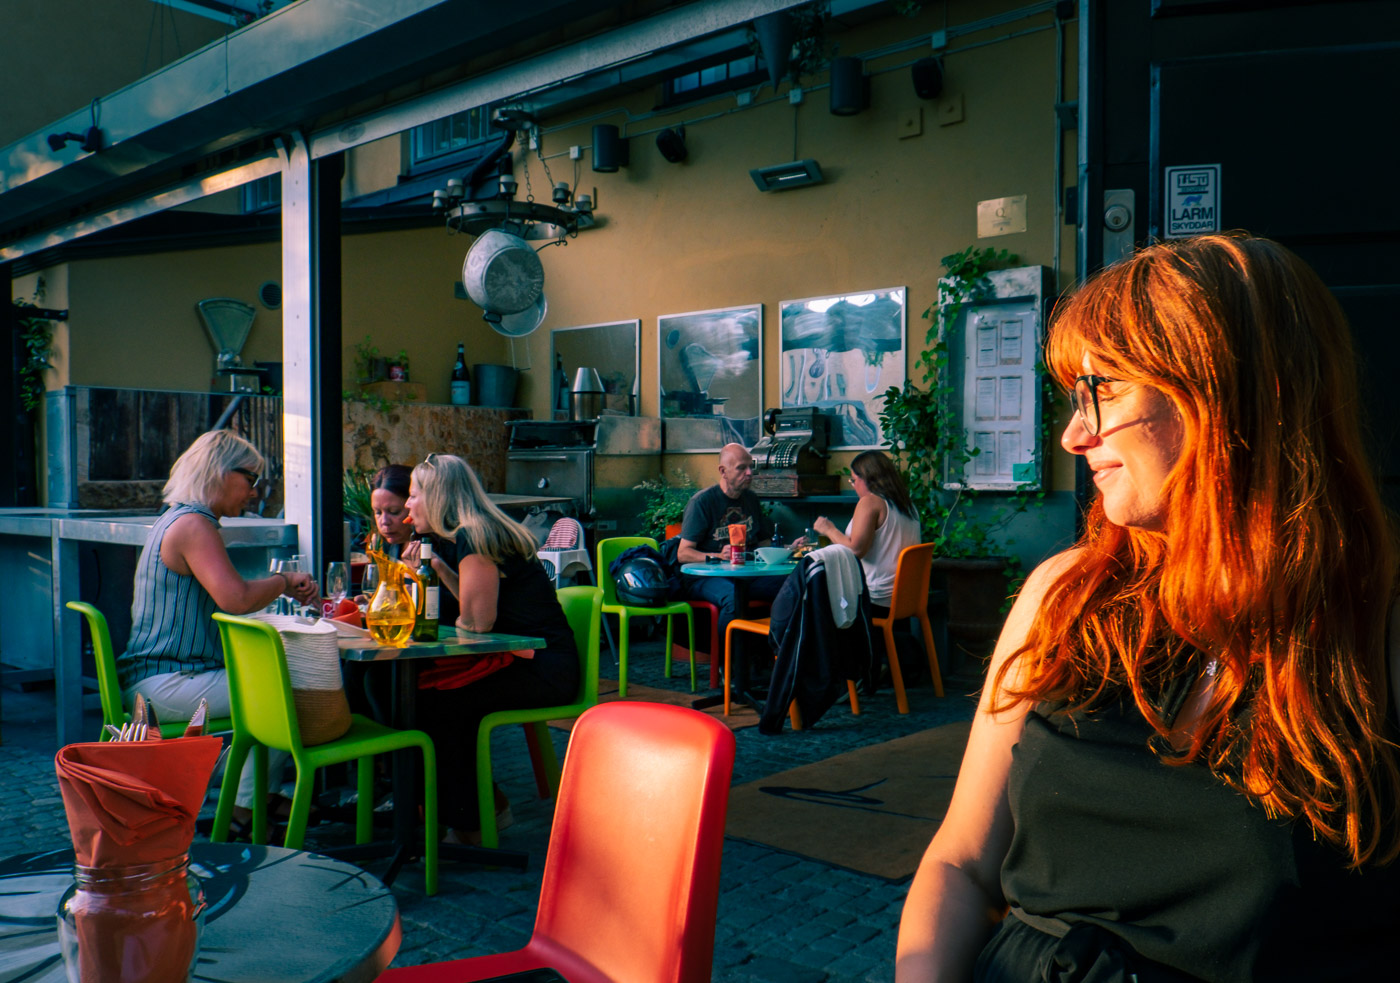 Restaurang Enoteket i Norrköping